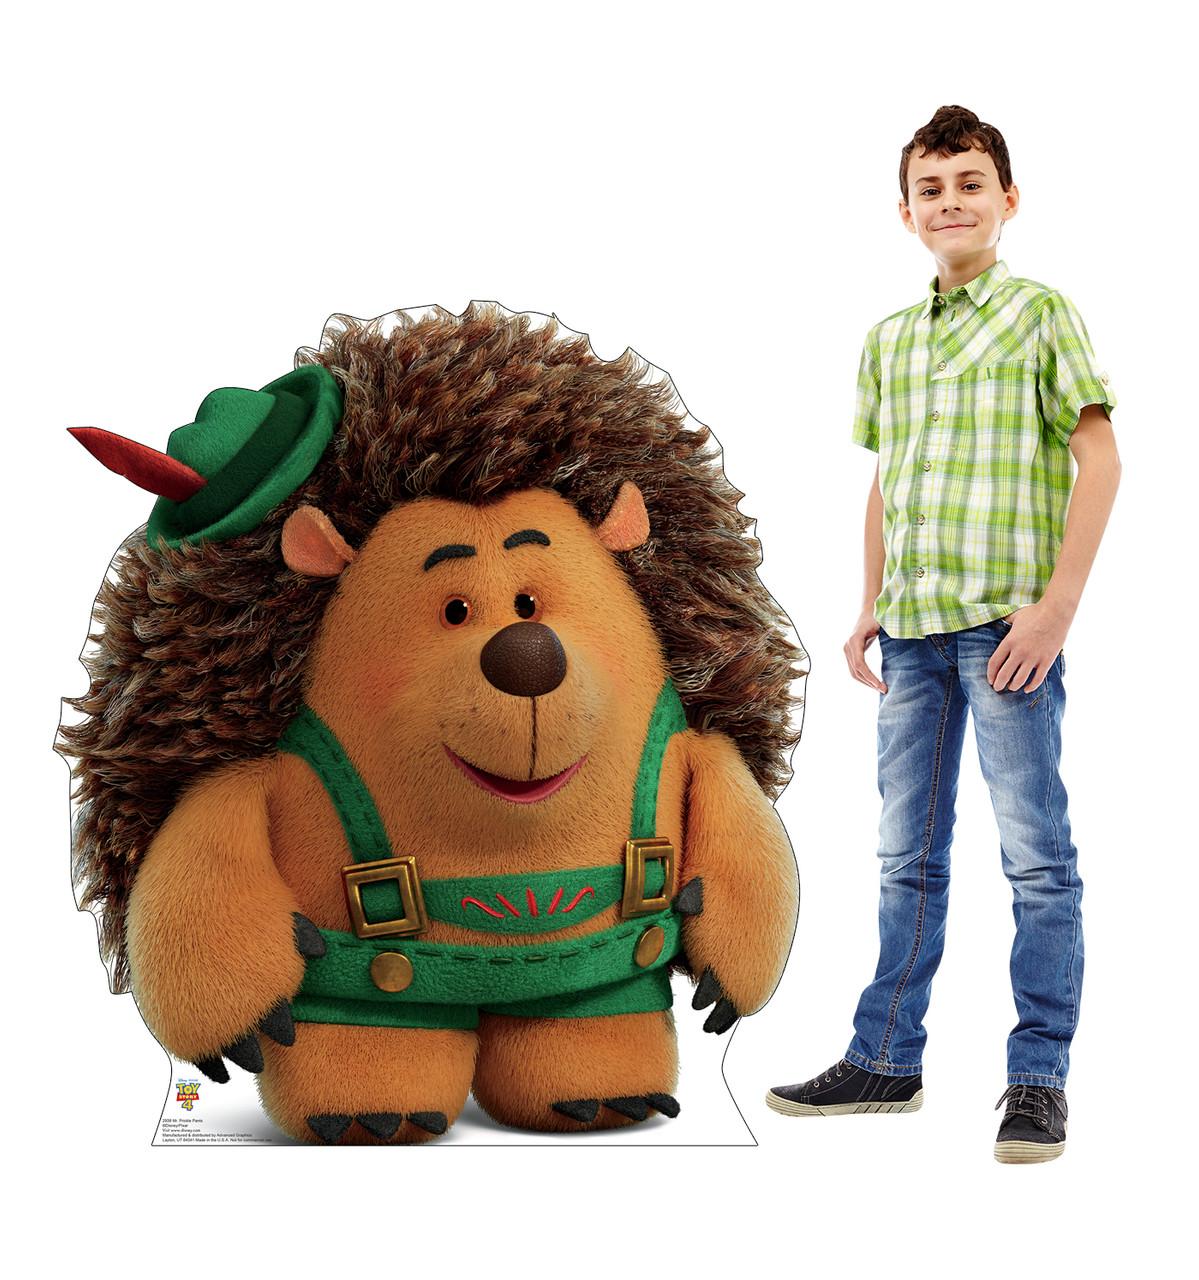 Mr Prickle Pants - Toy Story 4 Cardboard Cutout Lifesize